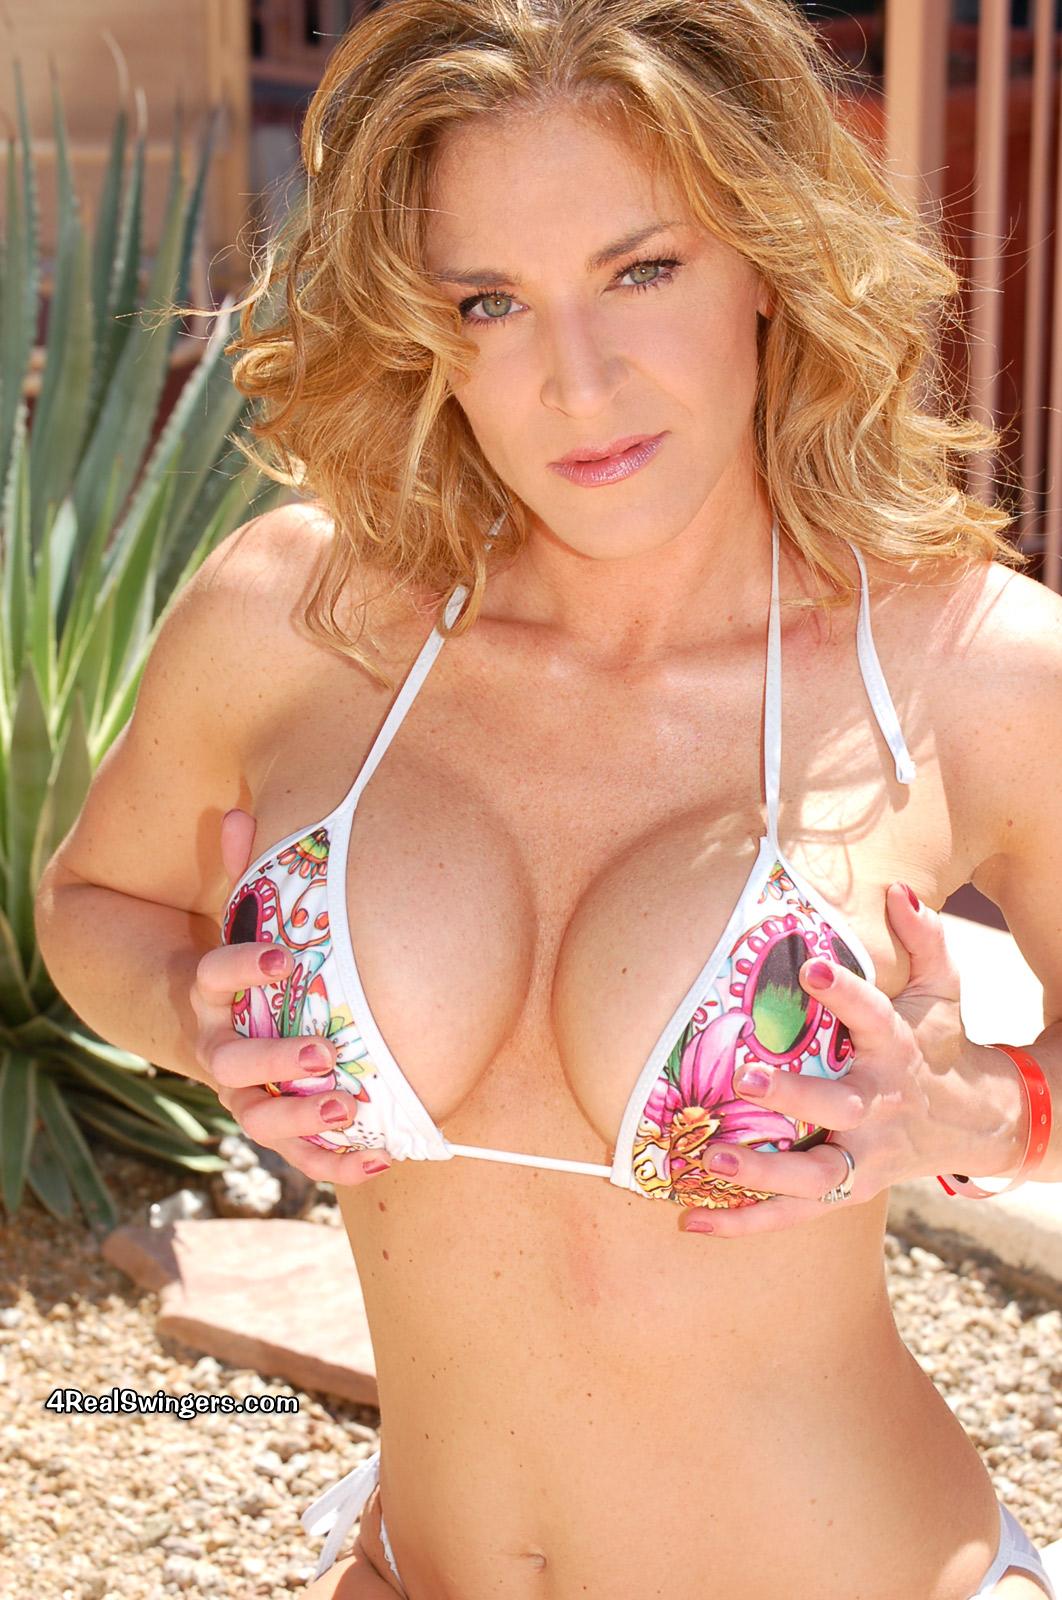 Anna Miller 4 Real Swingers grabbing tits